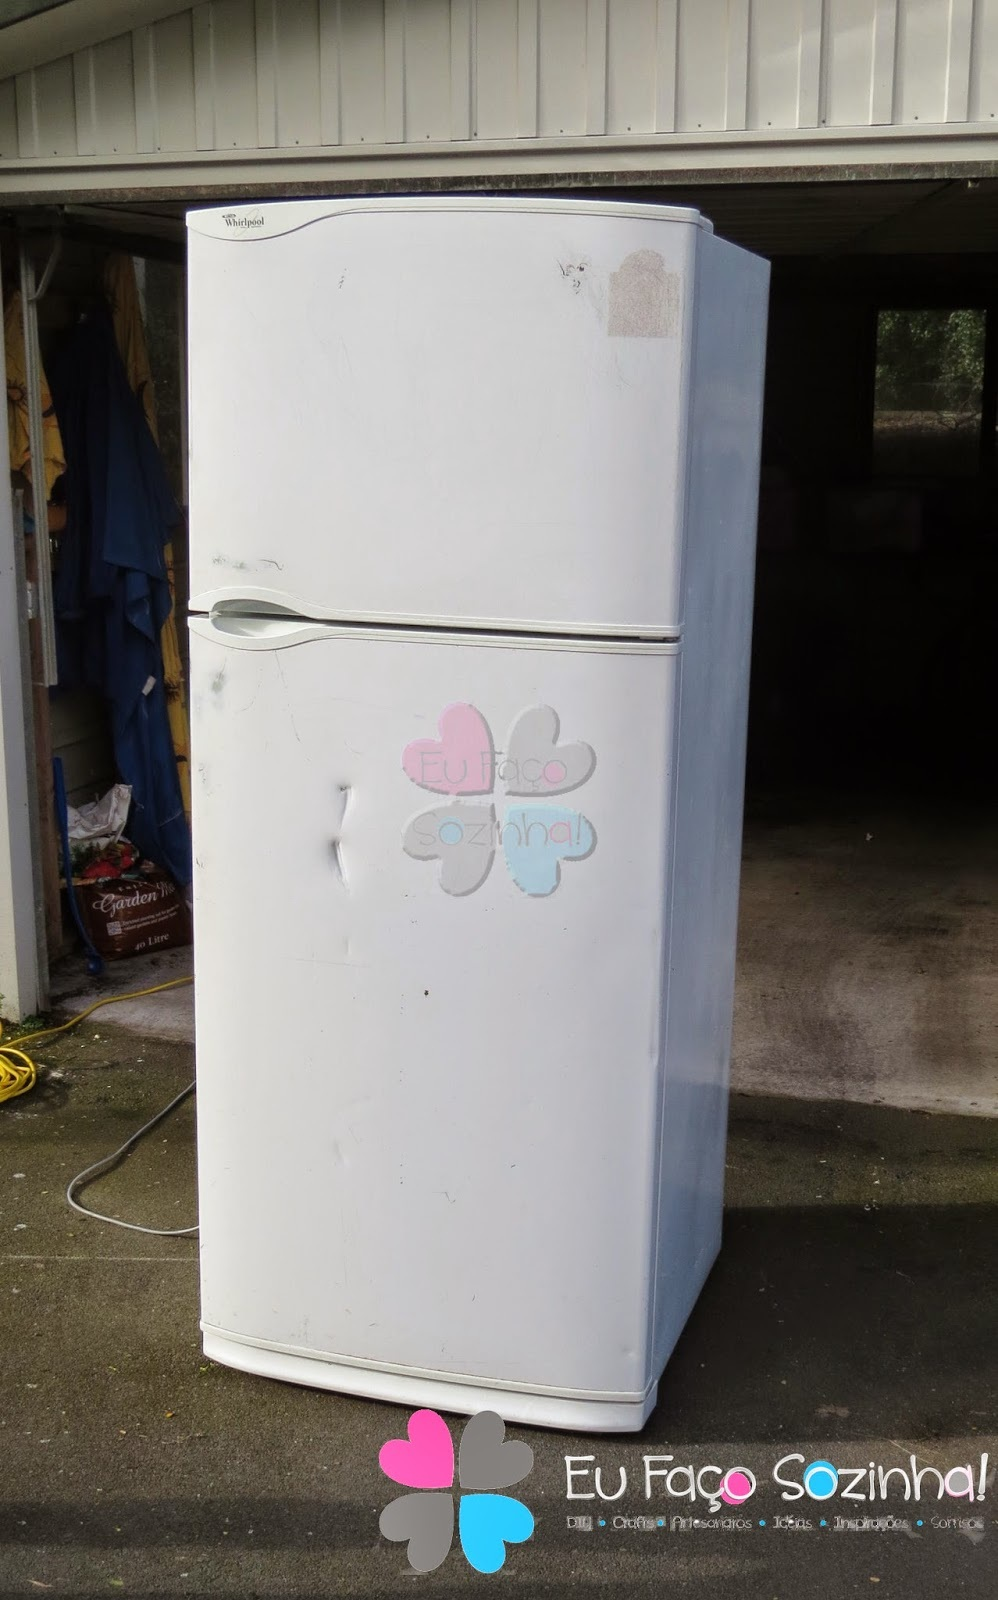 Pintando a geladeira / Painting the fridge